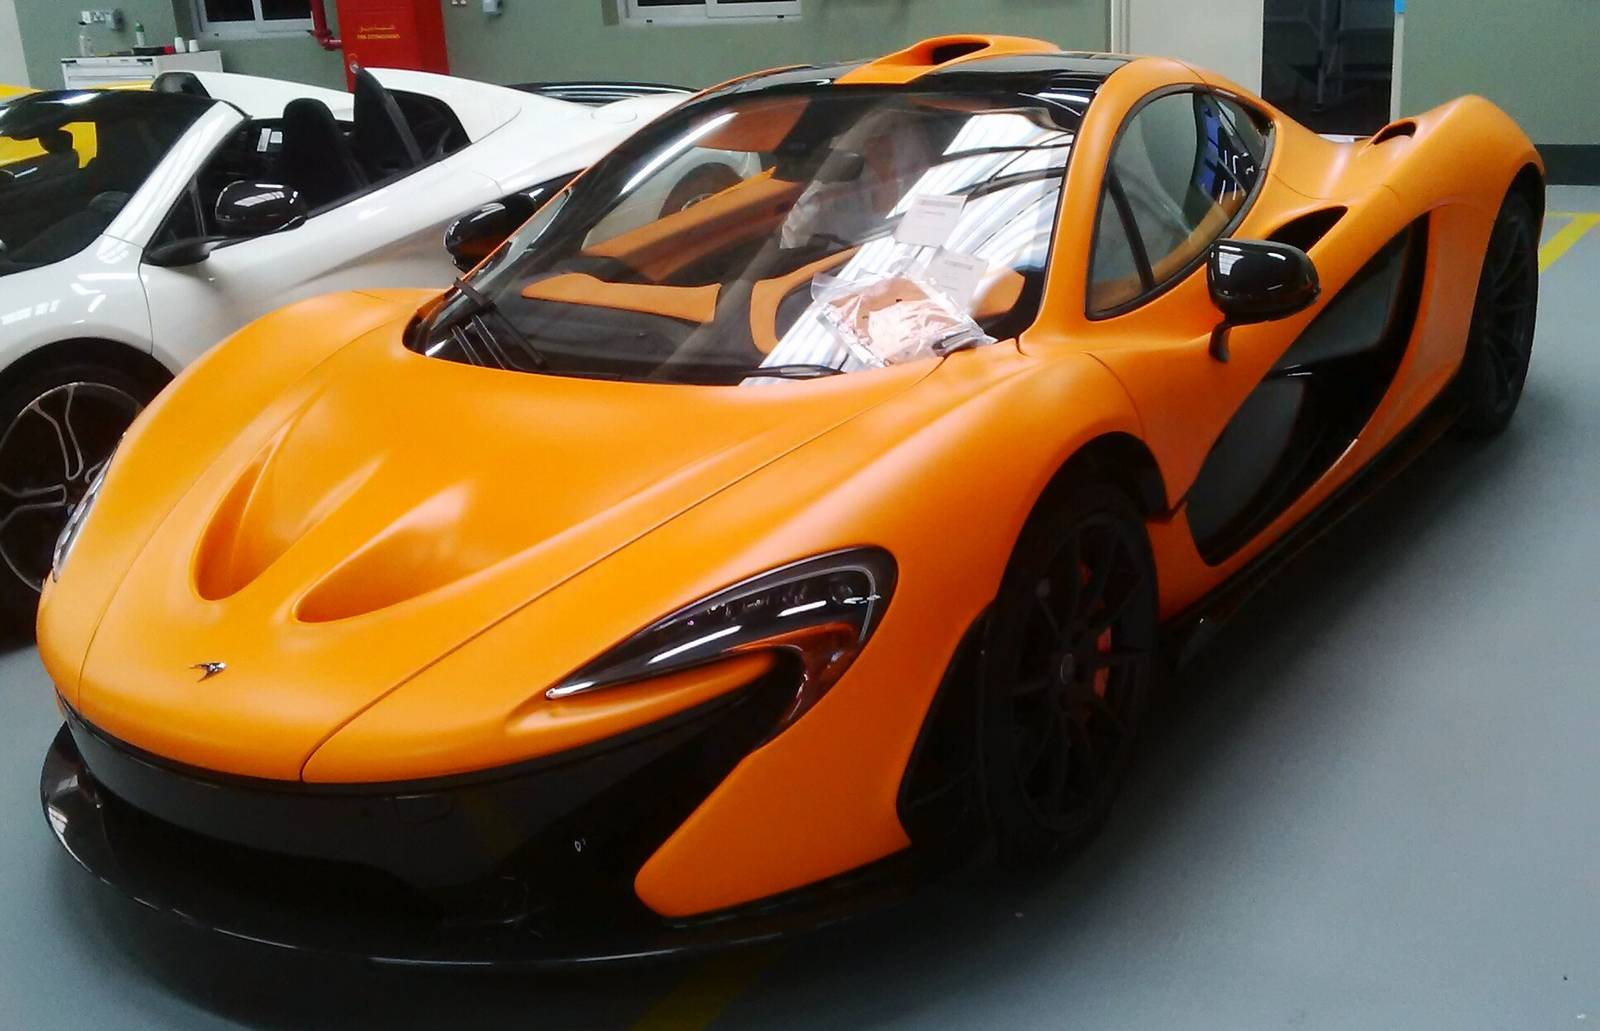 Mclaren P1 Orange >> World S First Satin Orange Mclaren P1 Arrives In Abu Dhabi